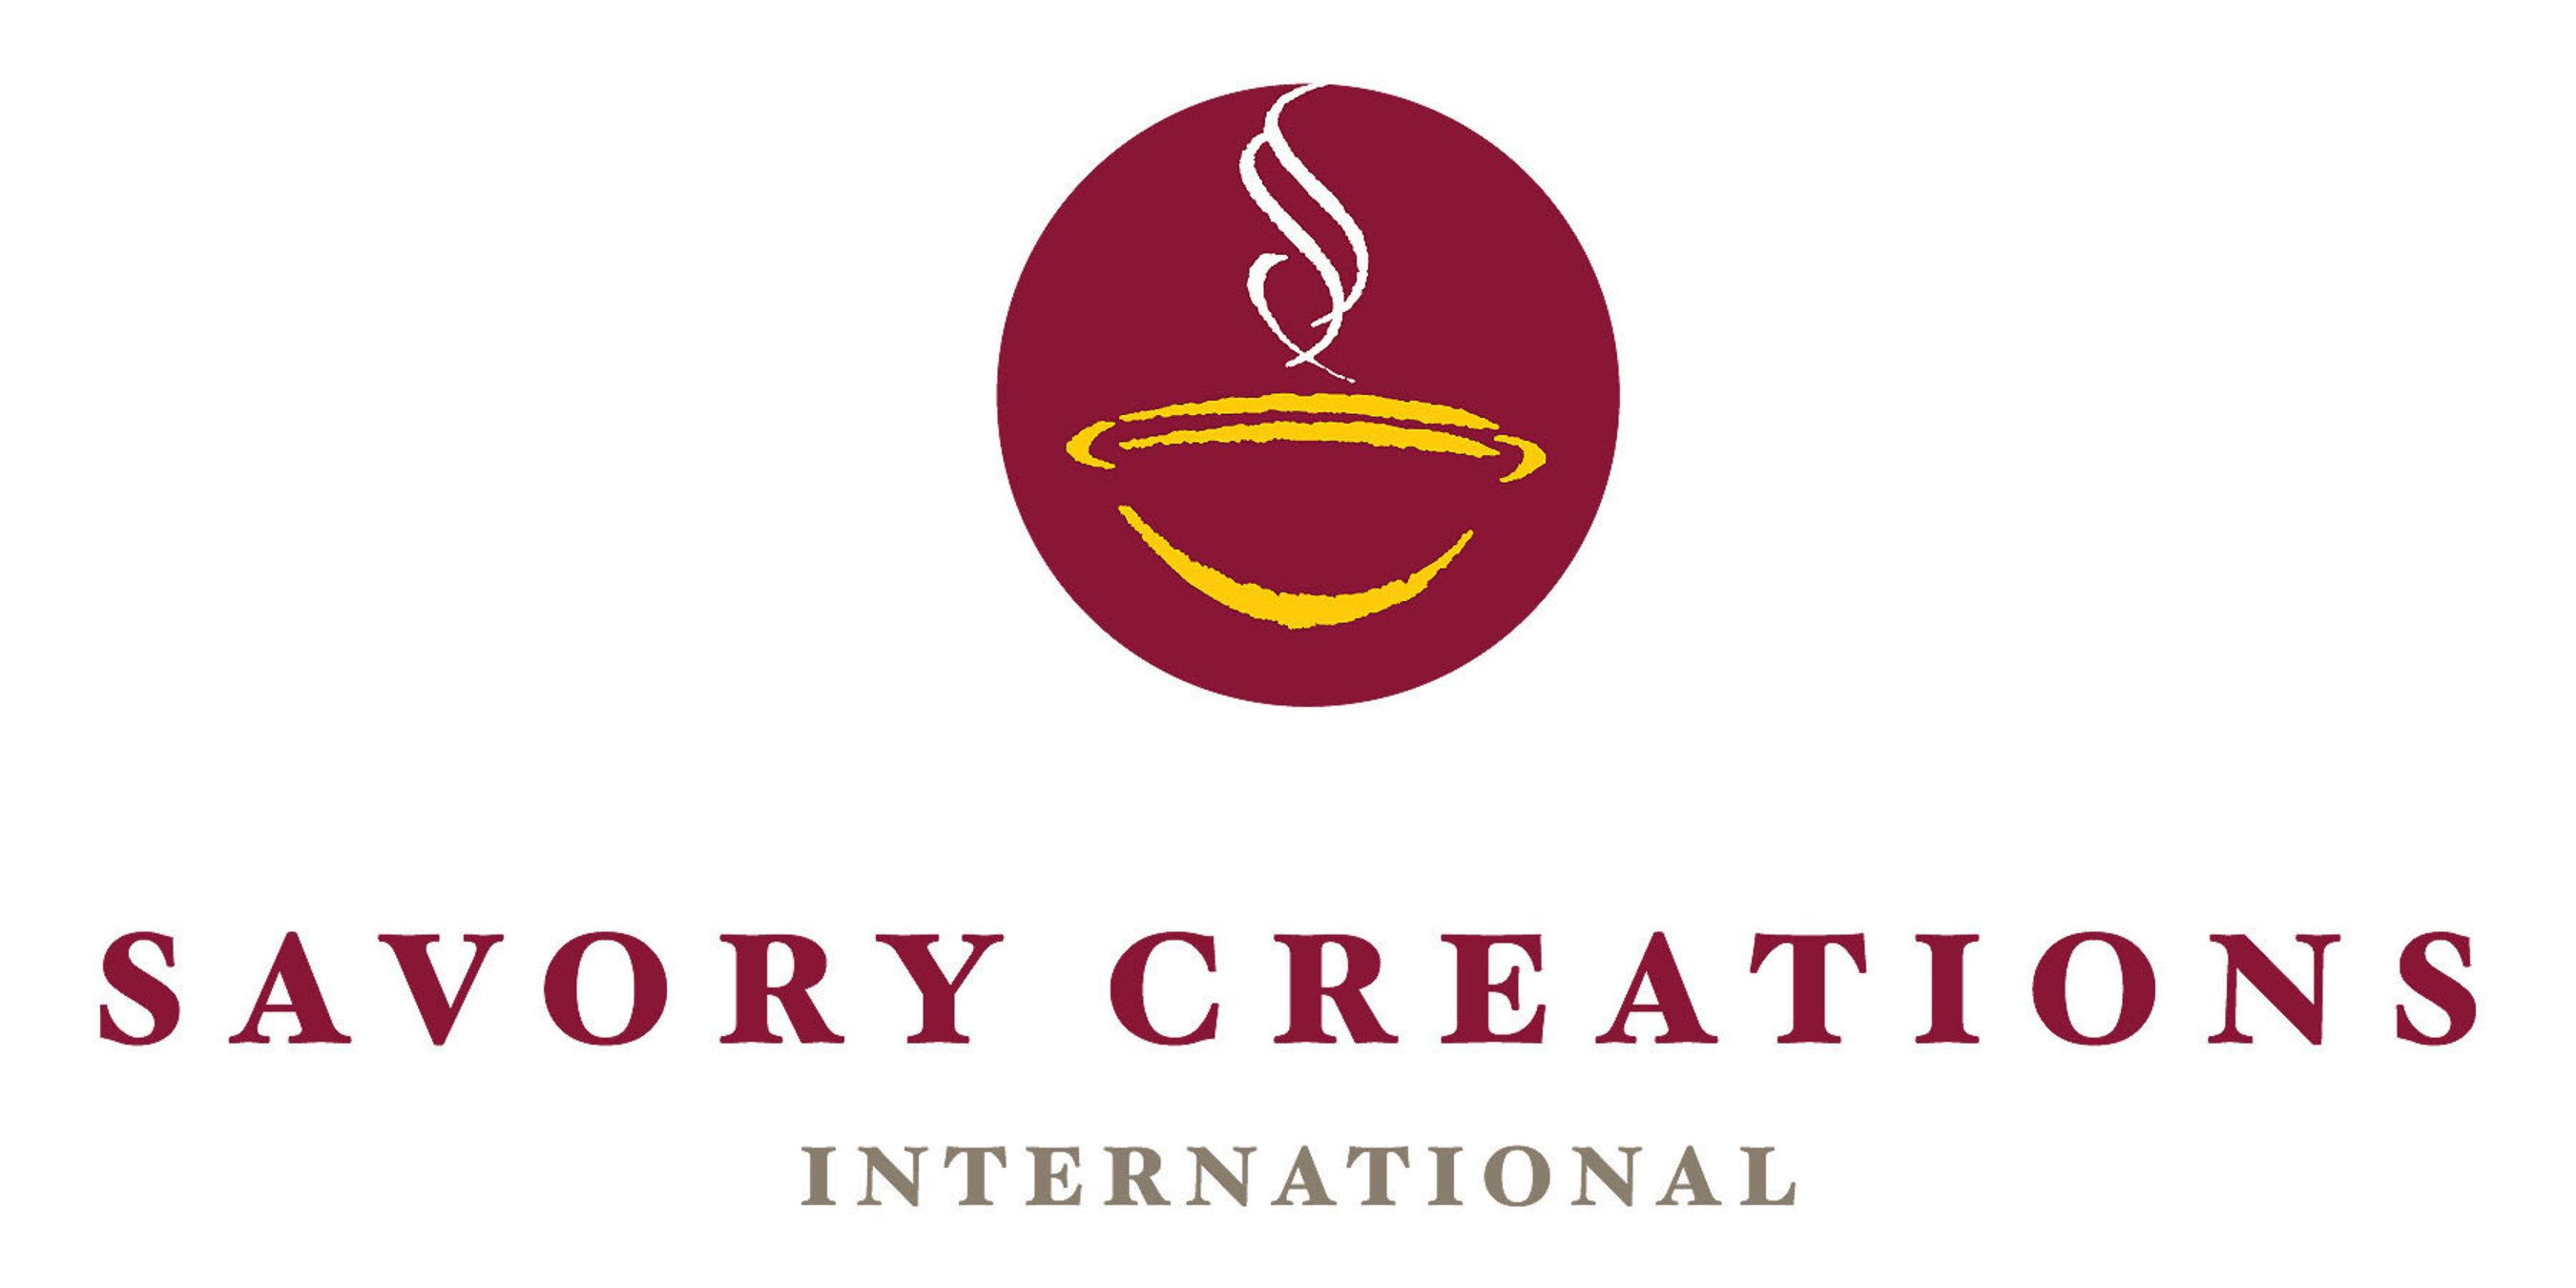 Savory Creations International logo. (PRNewsFoto/Savory Creations International) (PRNewsFoto/SAVORY CREATIONS INTERNATIONAL)